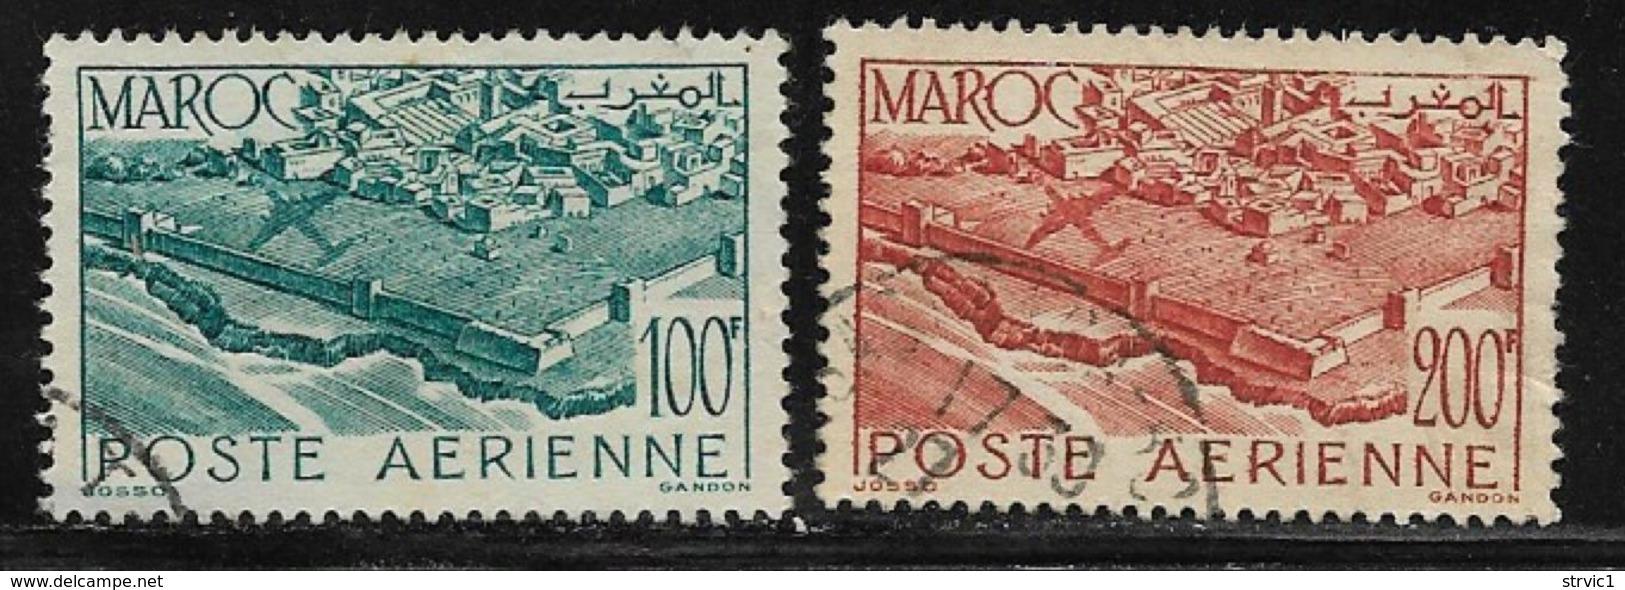 French Morocco Scott #C37-8 Used Plane Over La Medina , 1948 - Marocco (1891-1956)